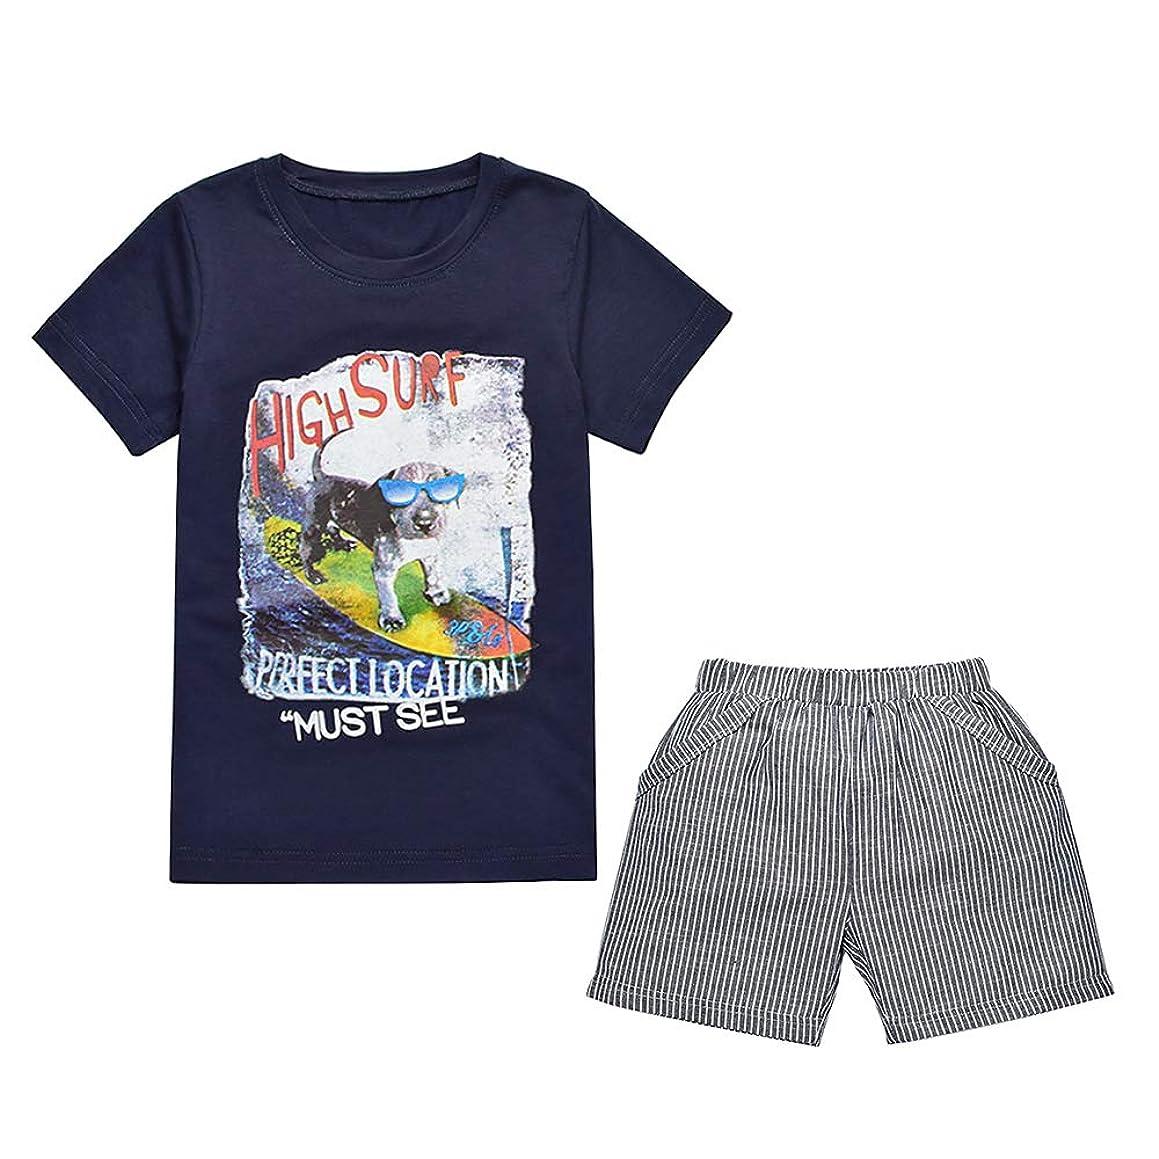 Boy's Cotton Clothing Sets T-Shirt&Shorts 2 Packs1-6 Years